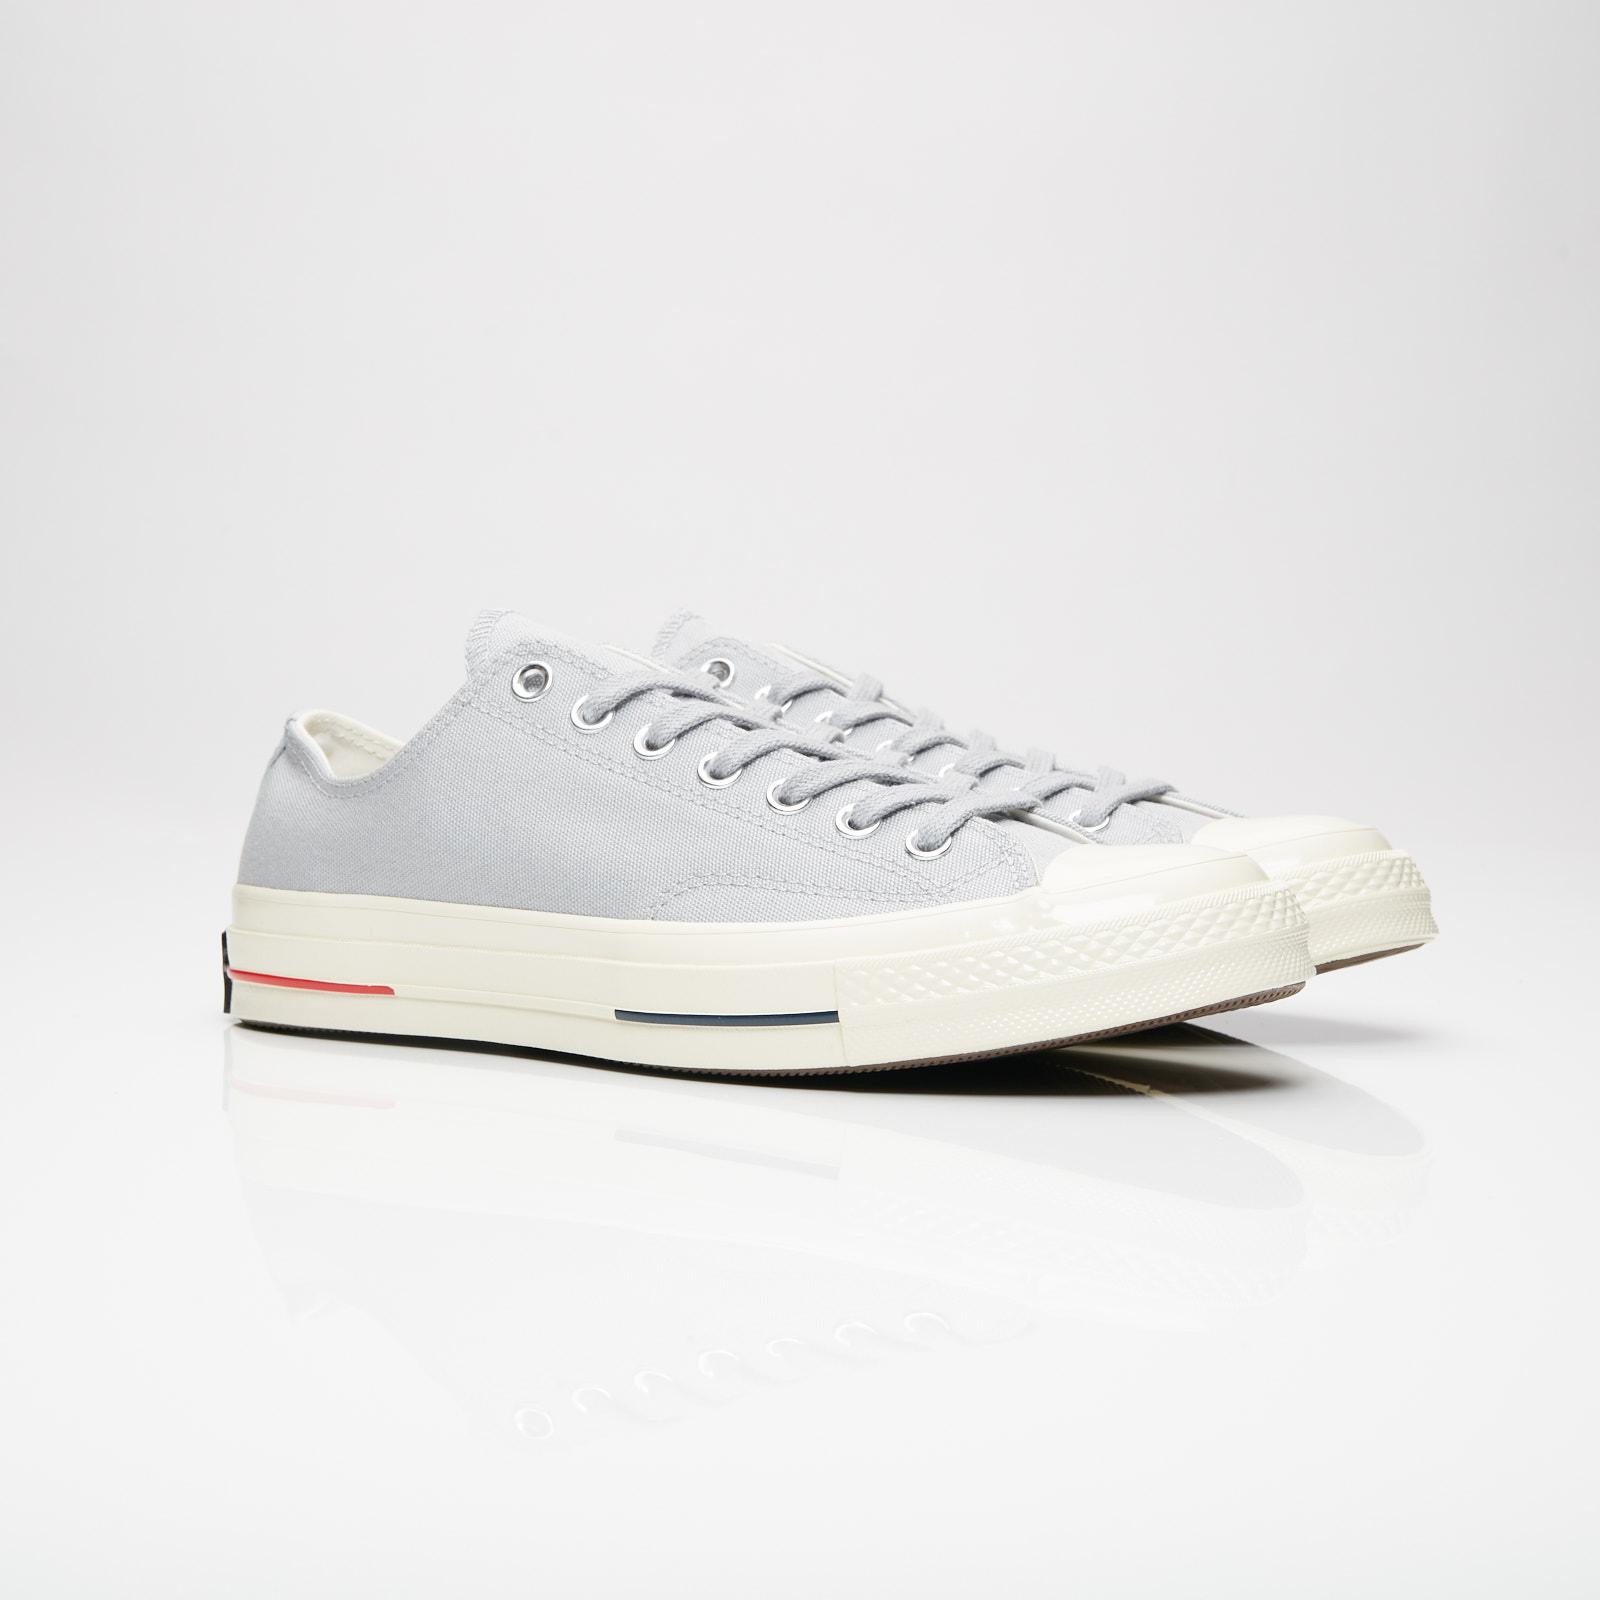 mizuno shoes size 39 for ladies 70s